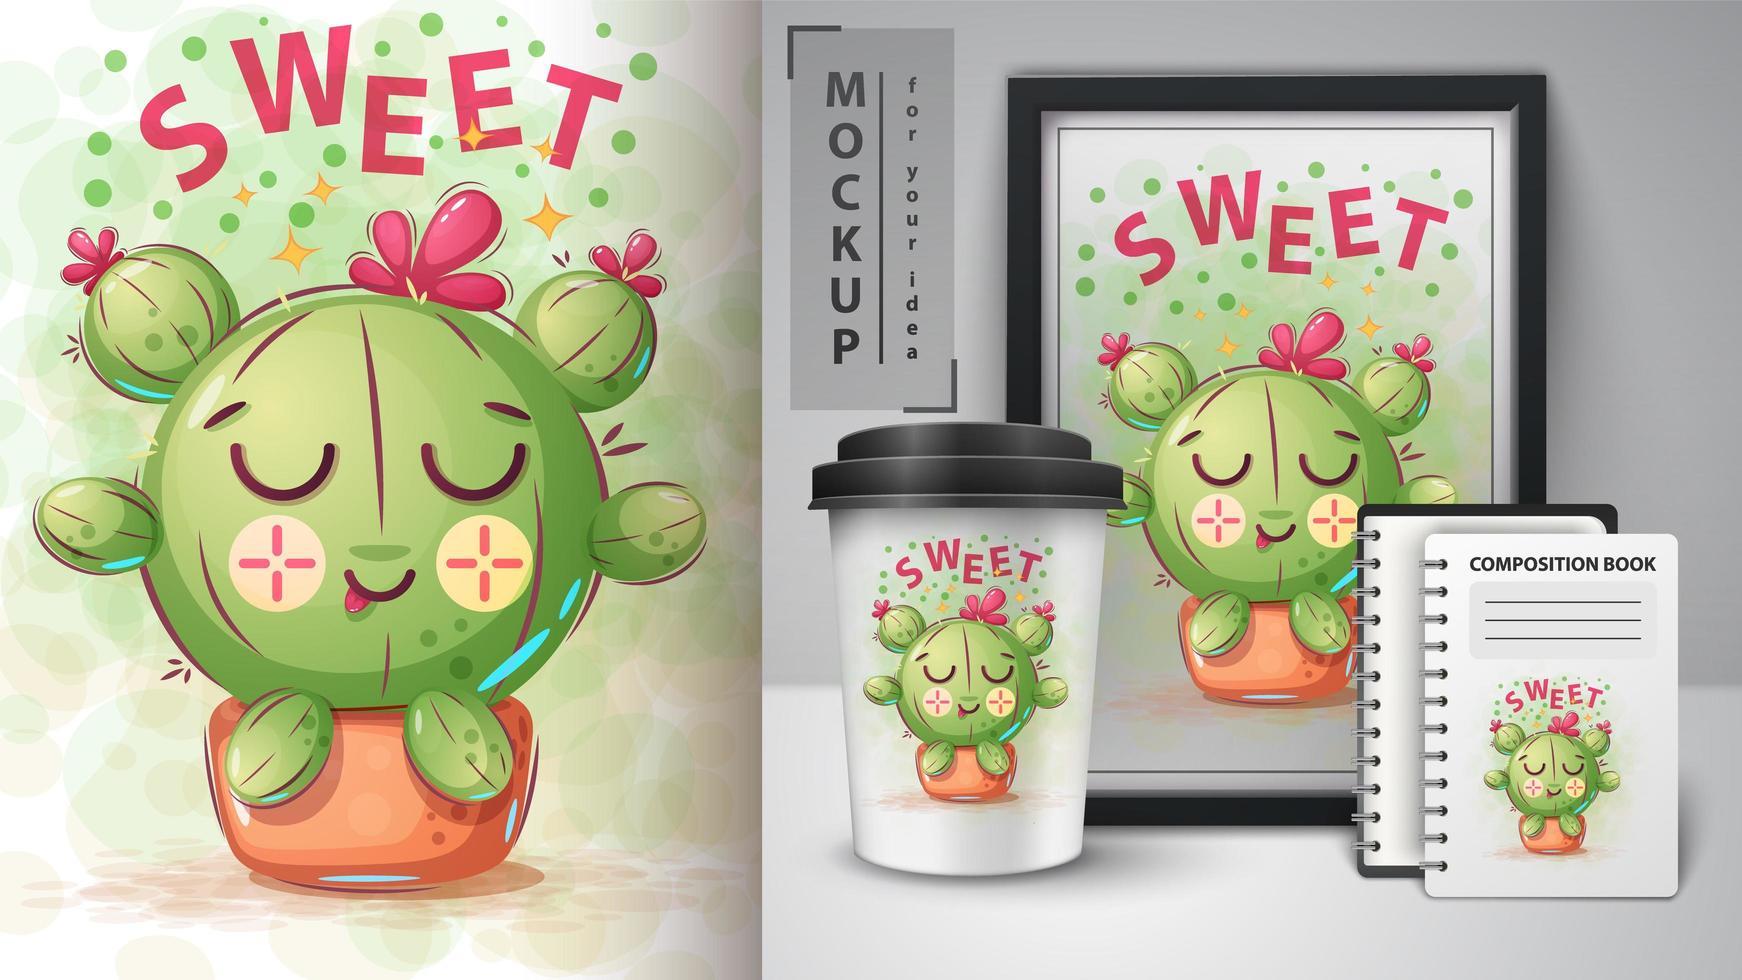 tecknad prinsessa söt kaktus design vektor